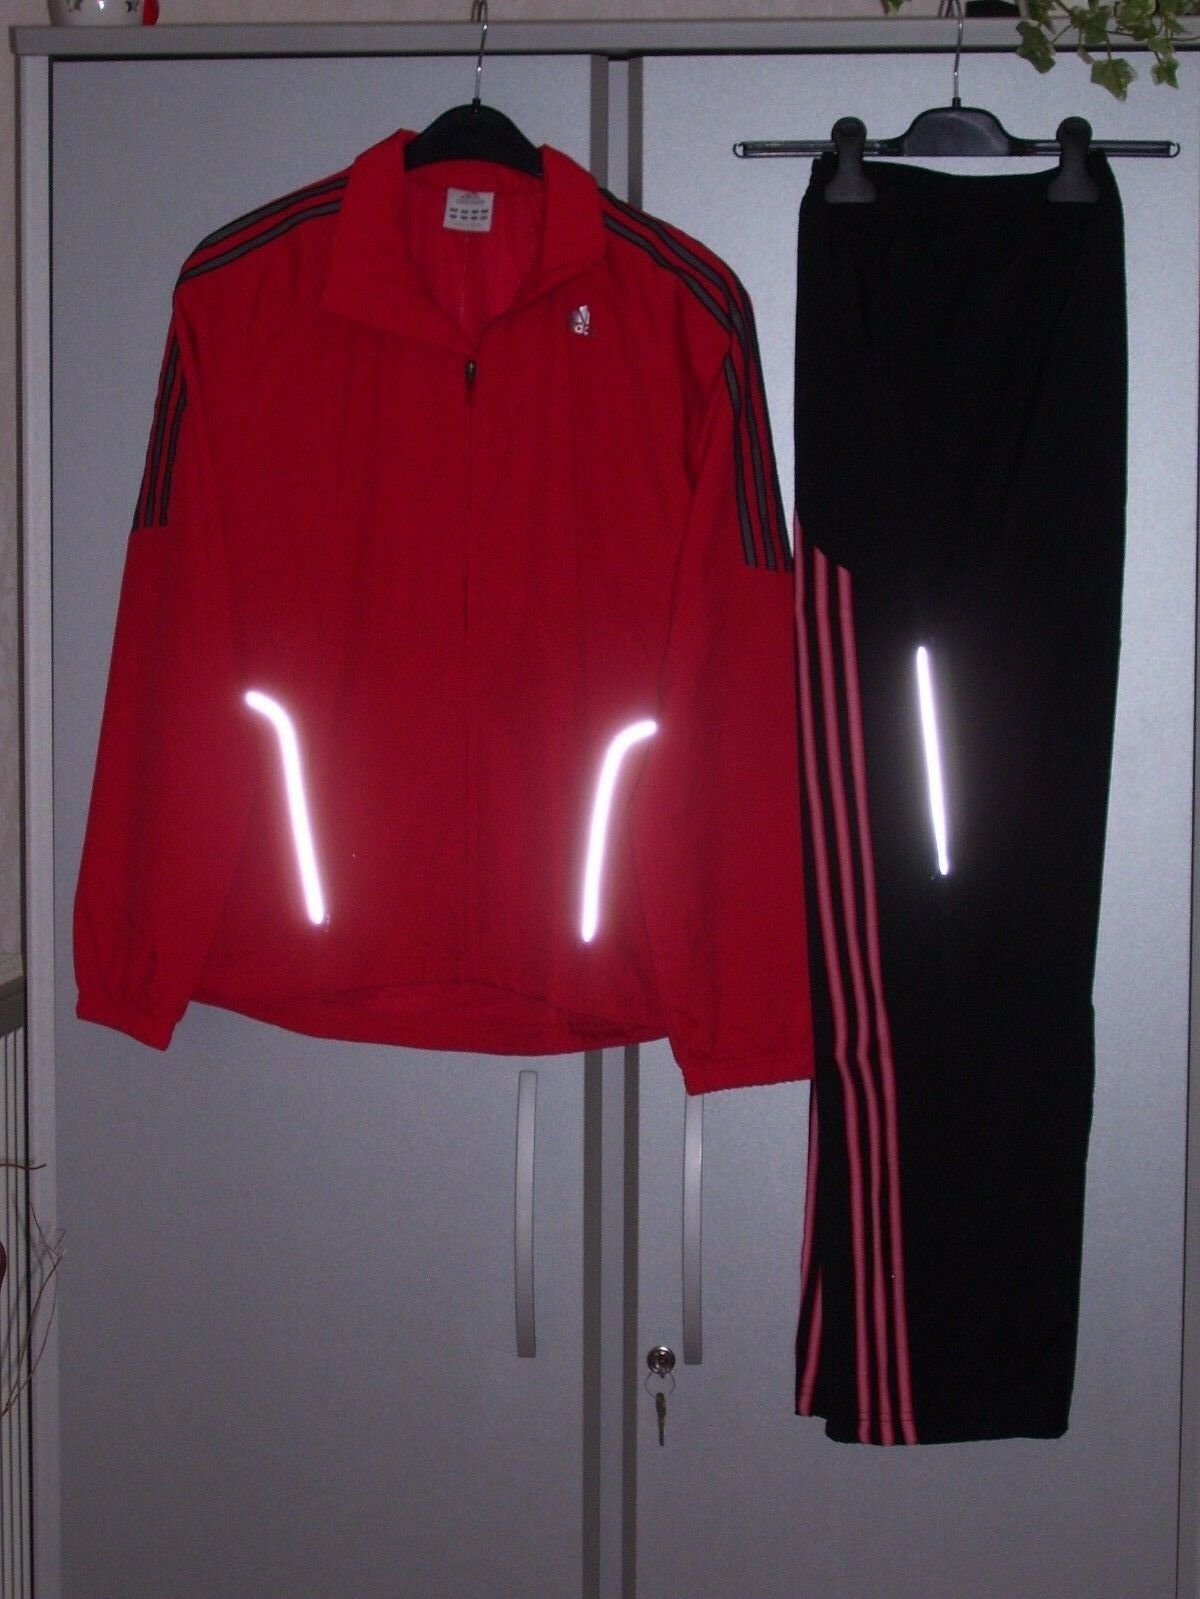 ADIDAS Herren Trainingsanzug ClimaLite rot schwarz Jacke und Hose S XL neu